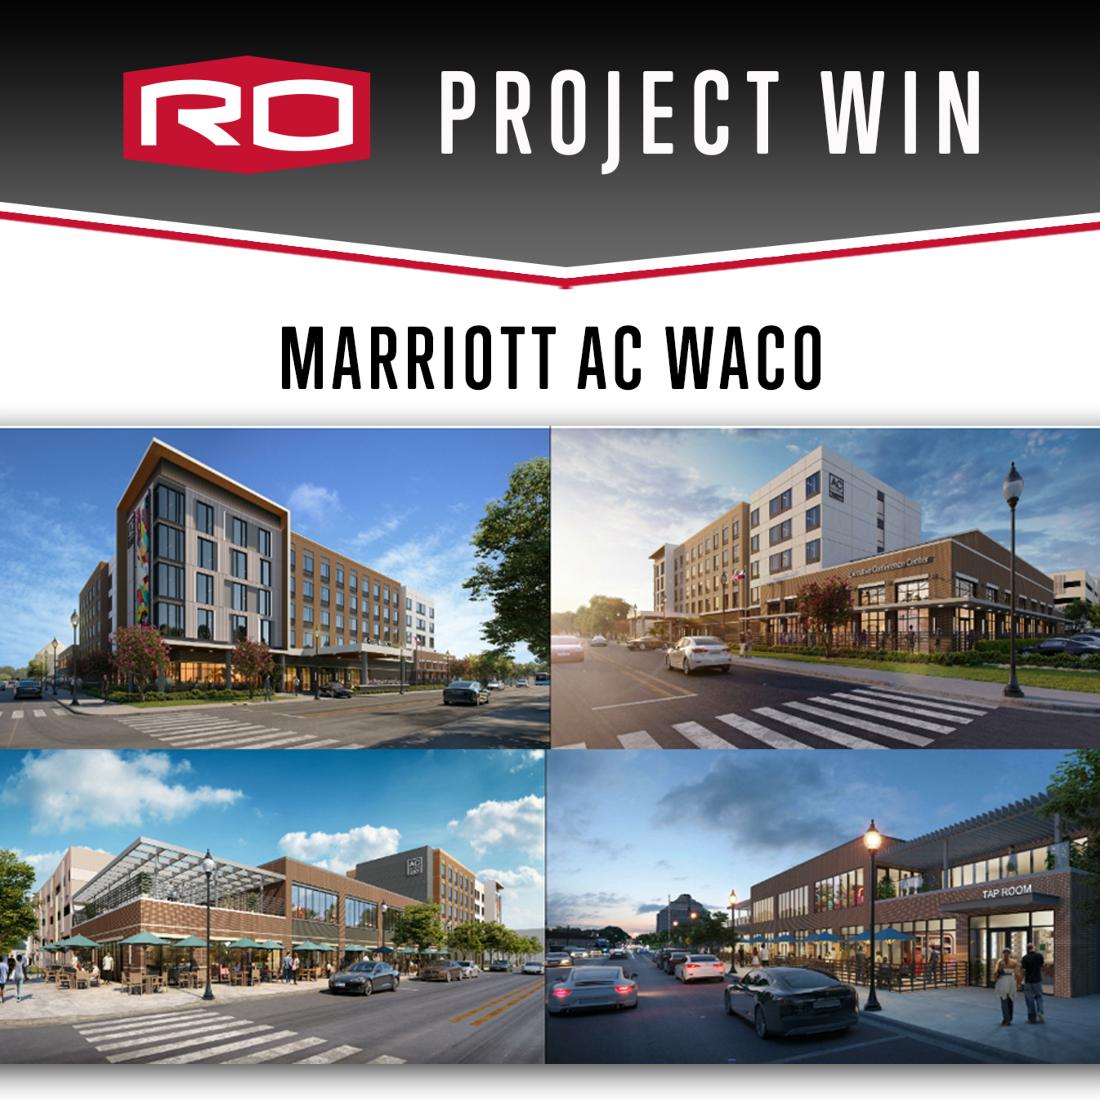 PROJECT WIN: MARRIOTT AC WACO